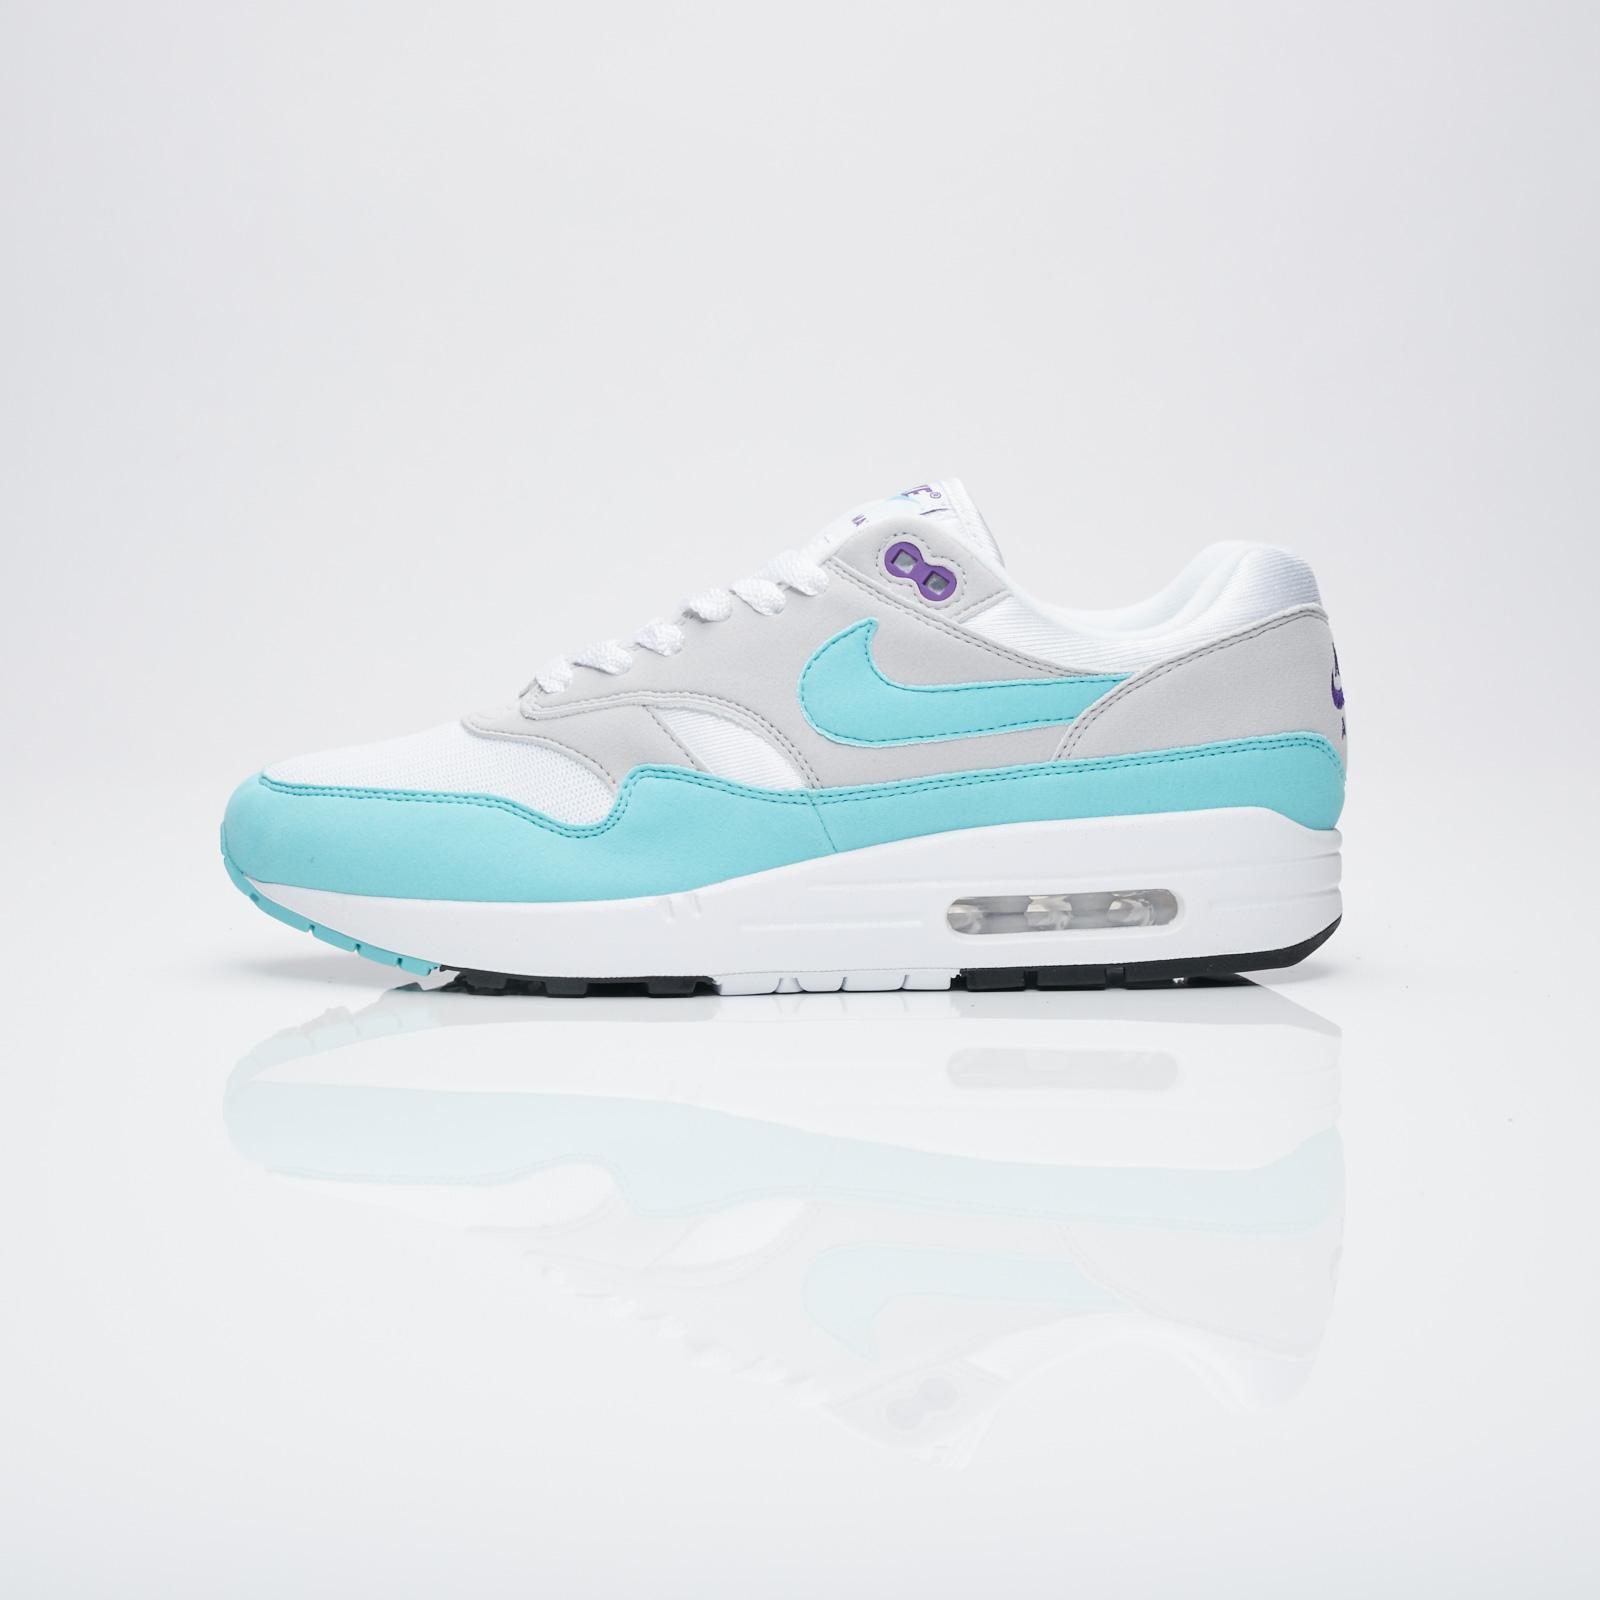 06e01045511 Nike Air Max 1 Anniversary - 908375-105 - Sneakersnstuff